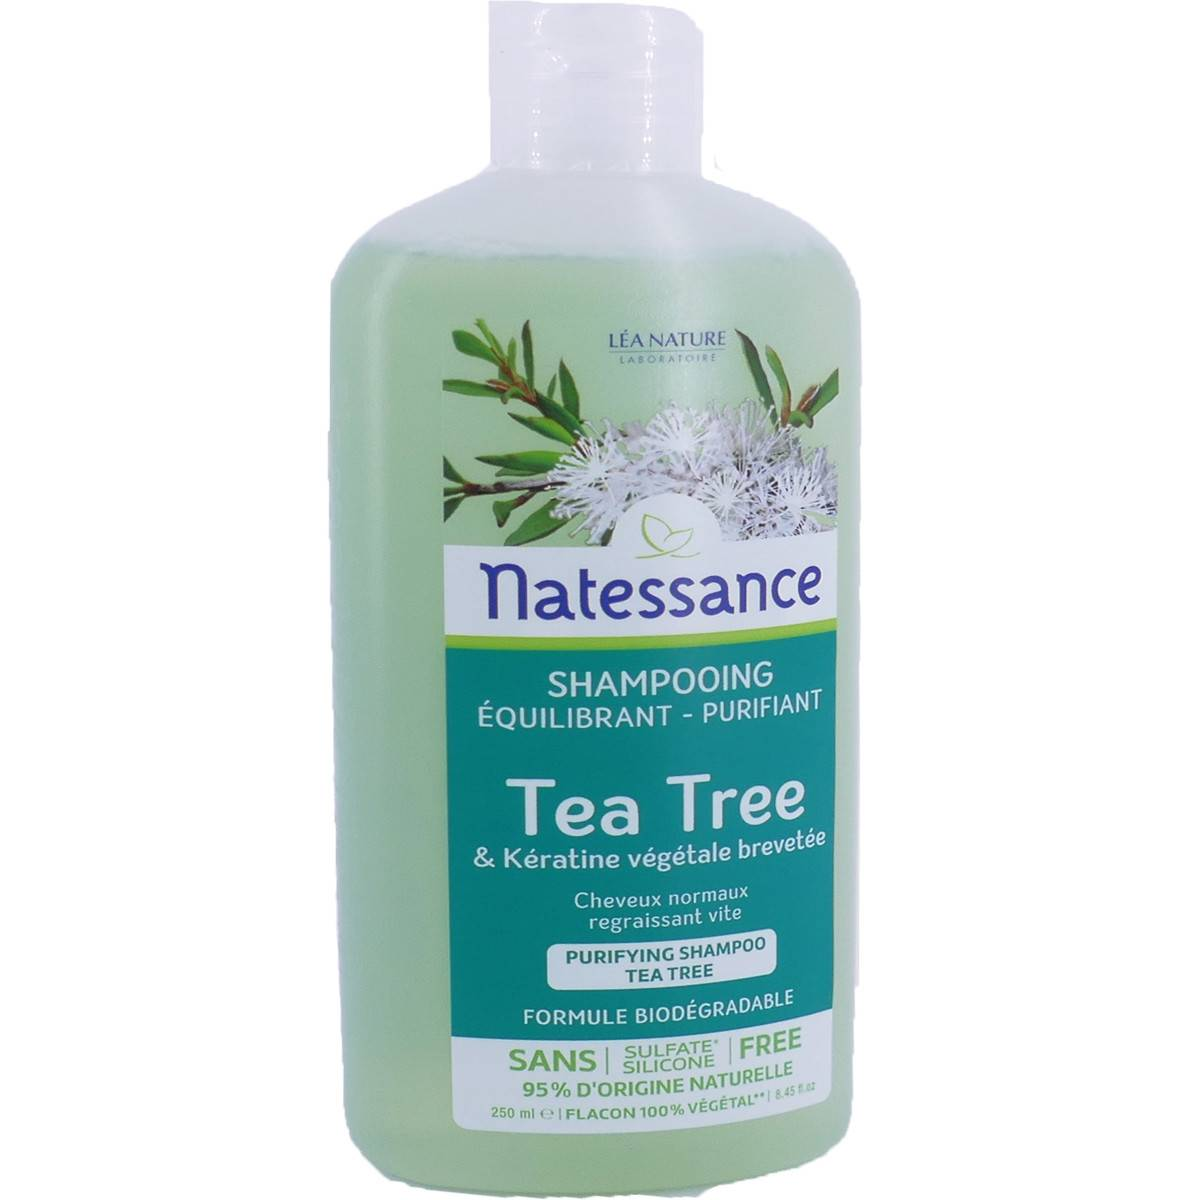 Natessance shampooing tea tree 250 ml